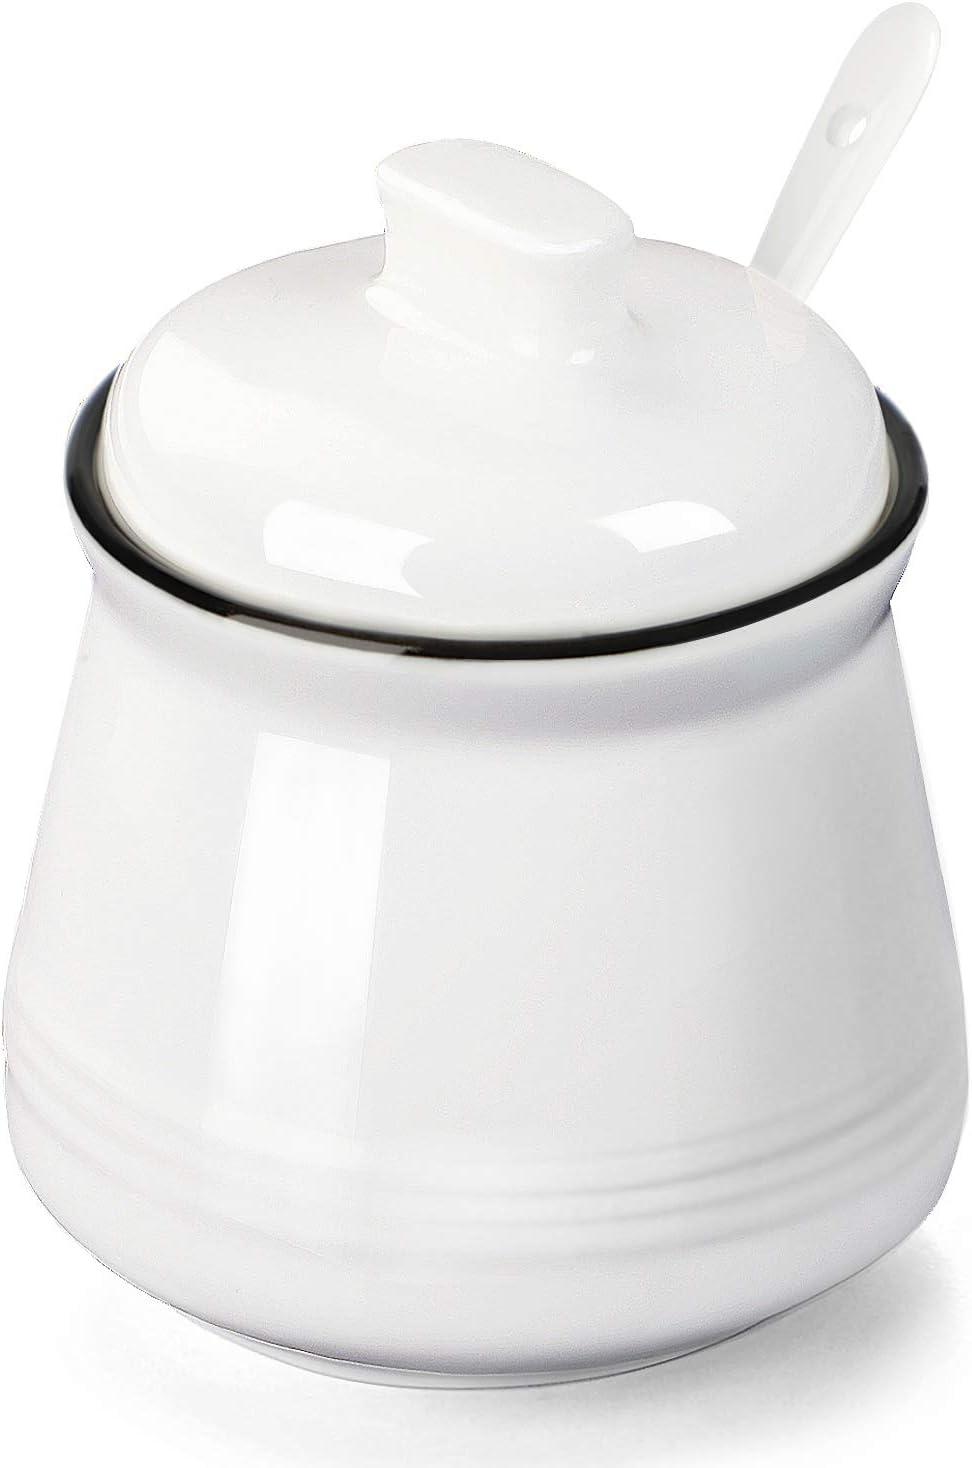 Porcelain Salt Bowl with Lid and Spoon,Ceramic Sugar Bowl 12oz ,White